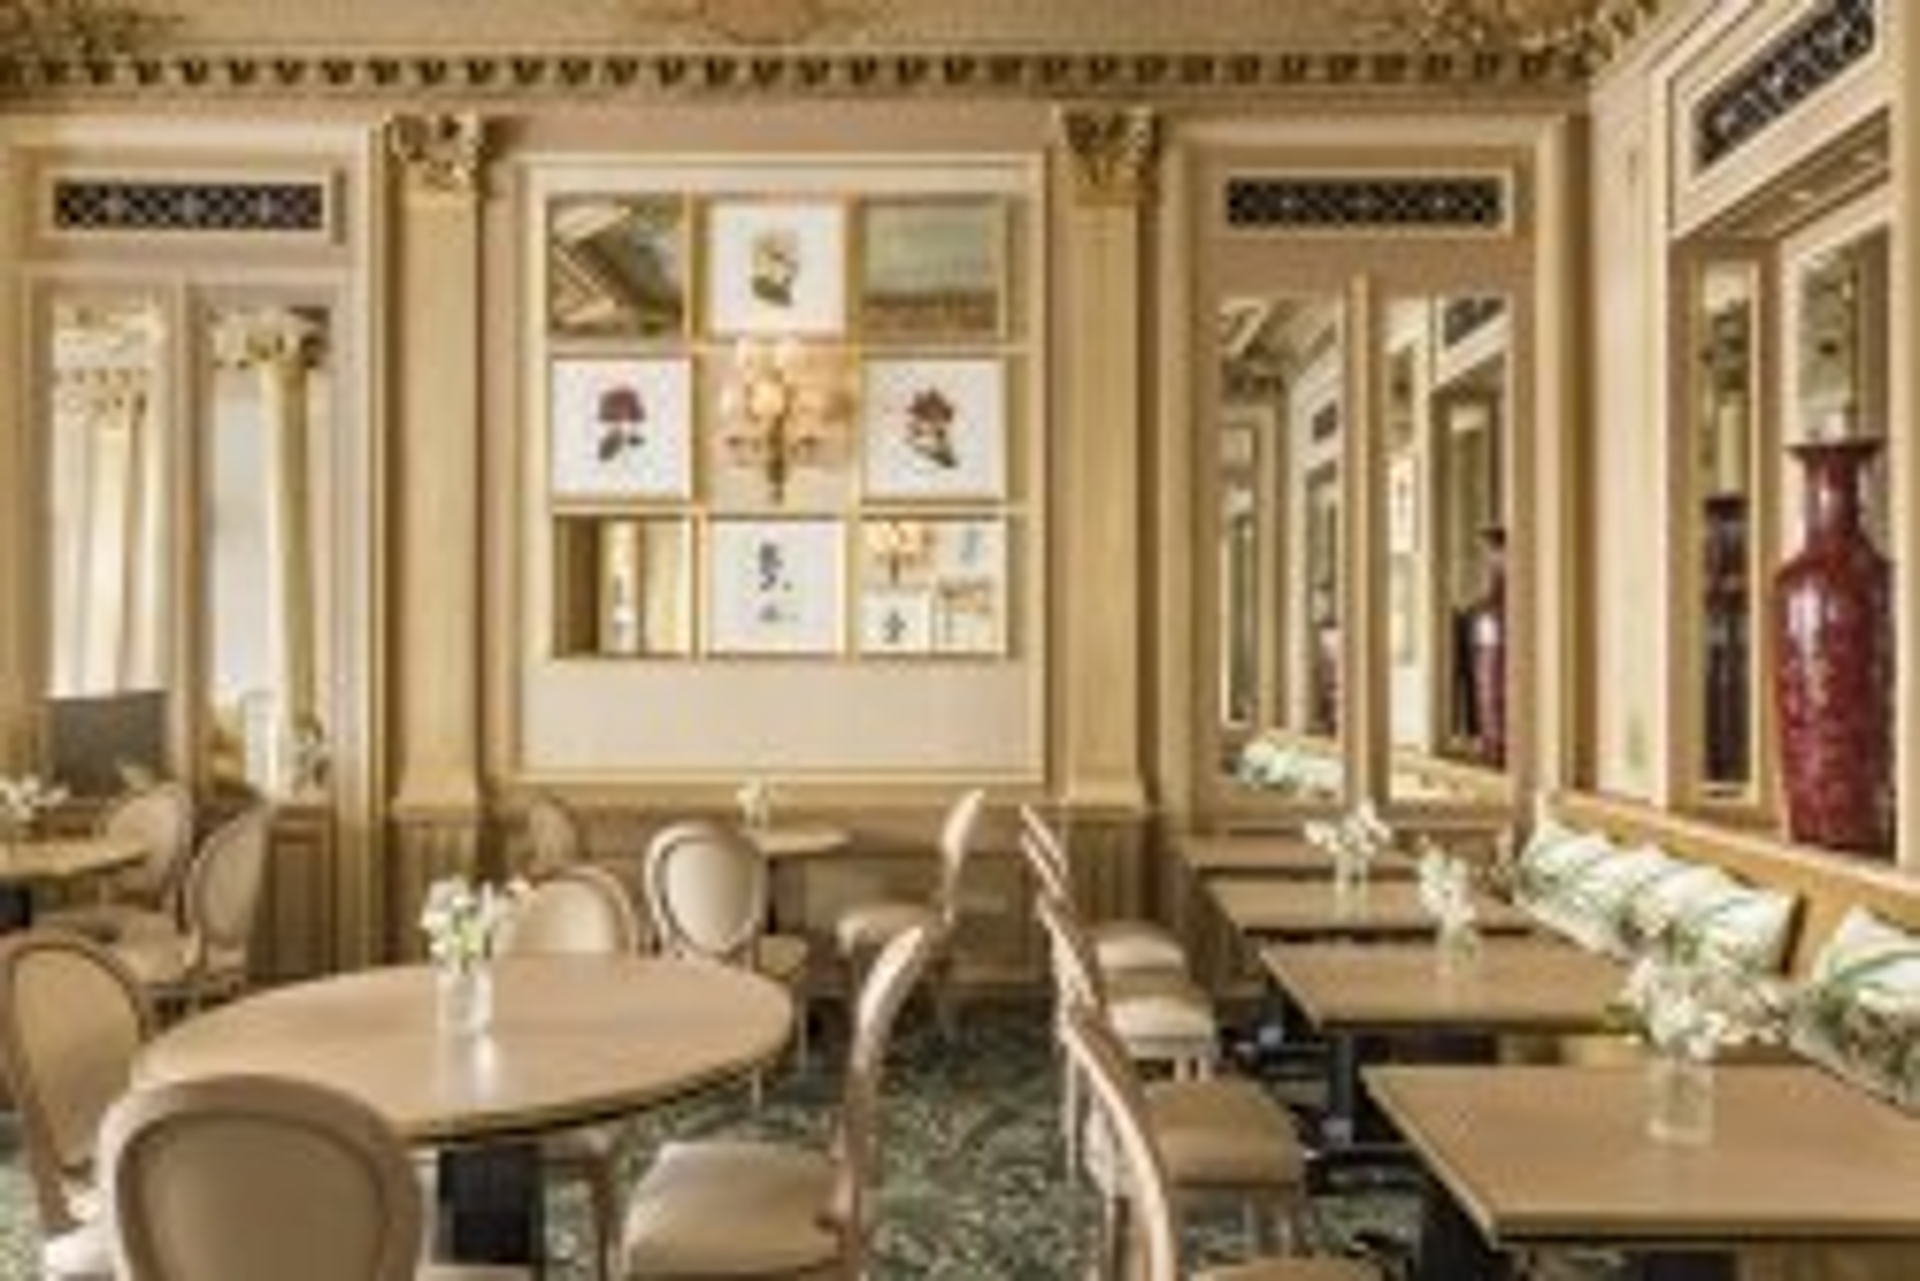 Repas entreprise dans une institution Parisienne restaurant groupe PARIS 9 75